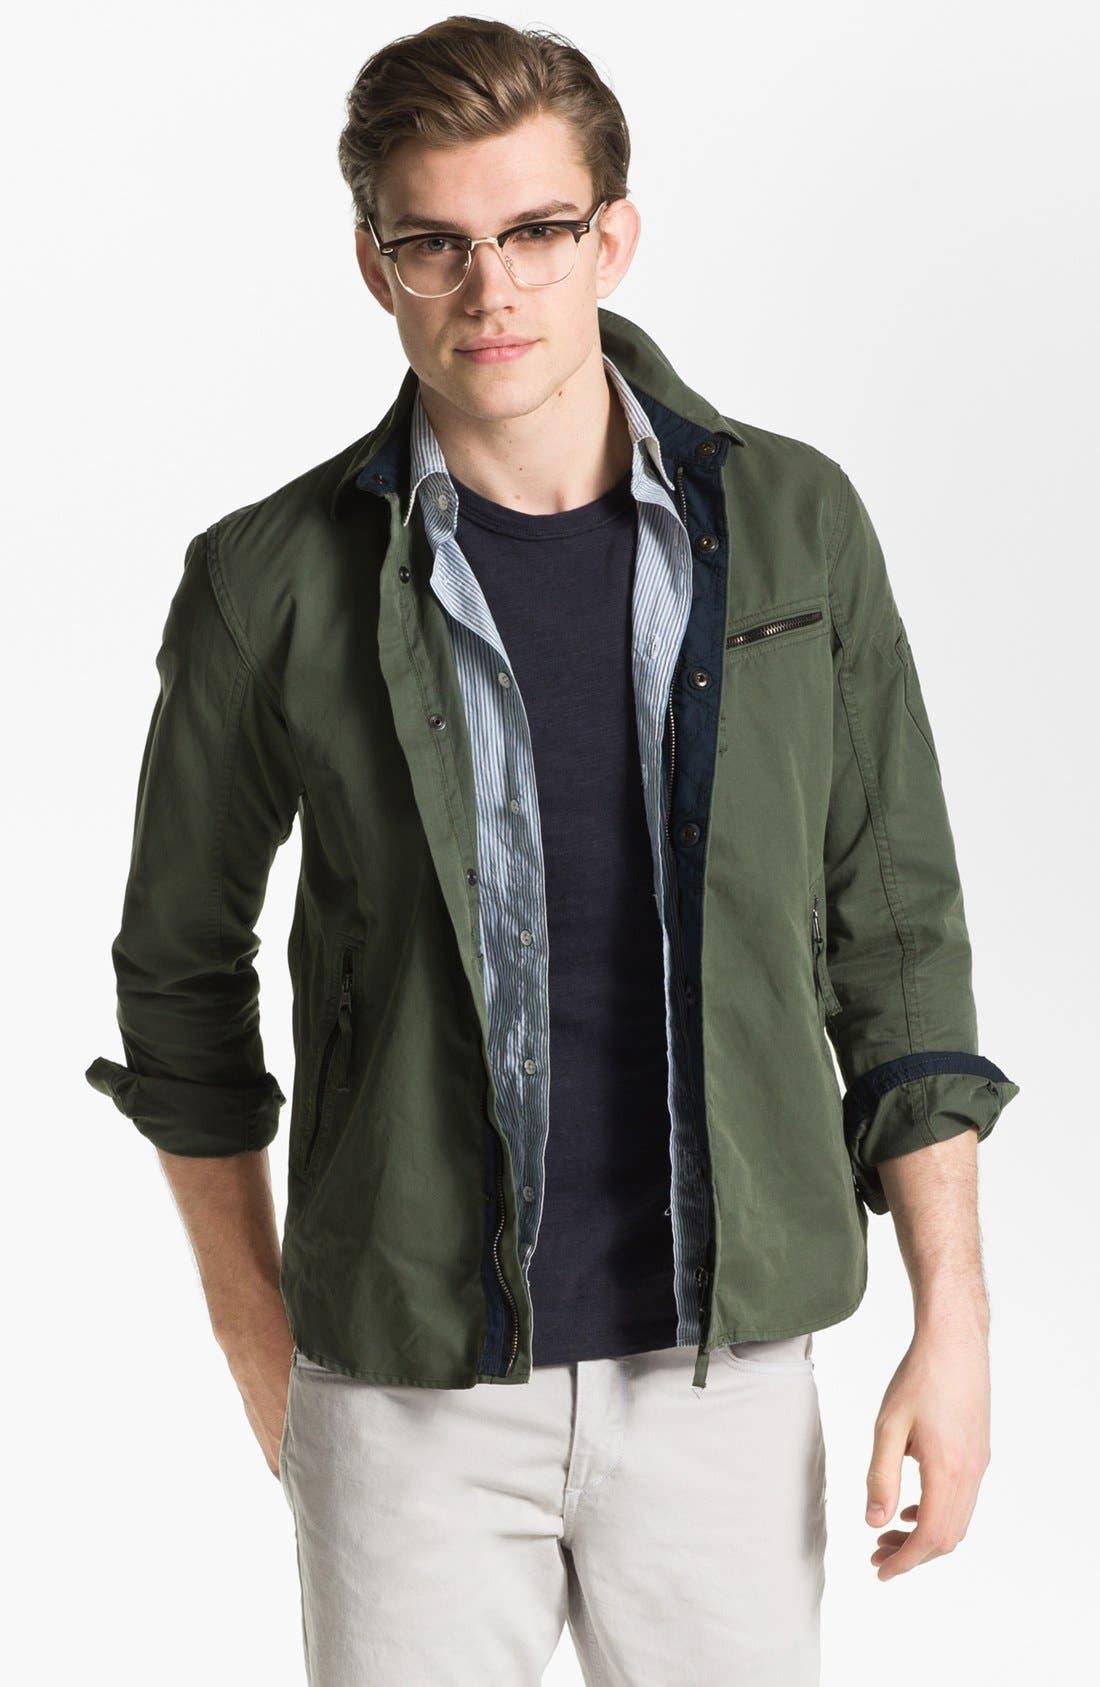 Alternate Image 1 Selected - rag & bone 'Hendon' Lightweight Jacket